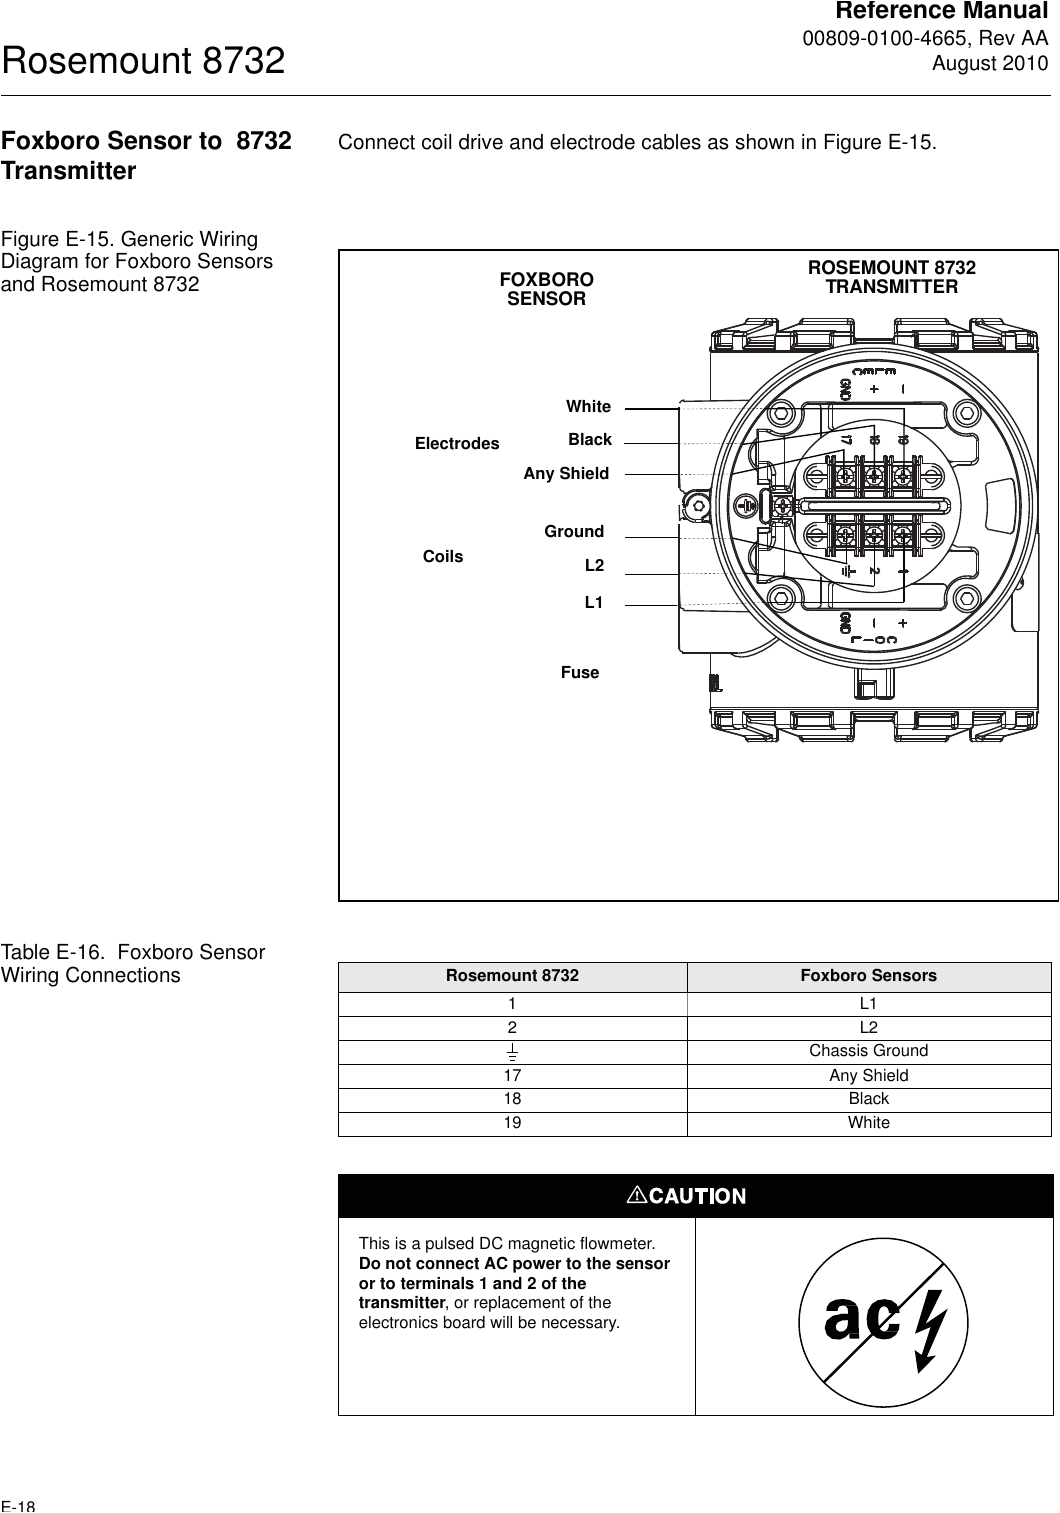 emersonrosemount8732usersmanual165675 30137492 user guide page 144 png